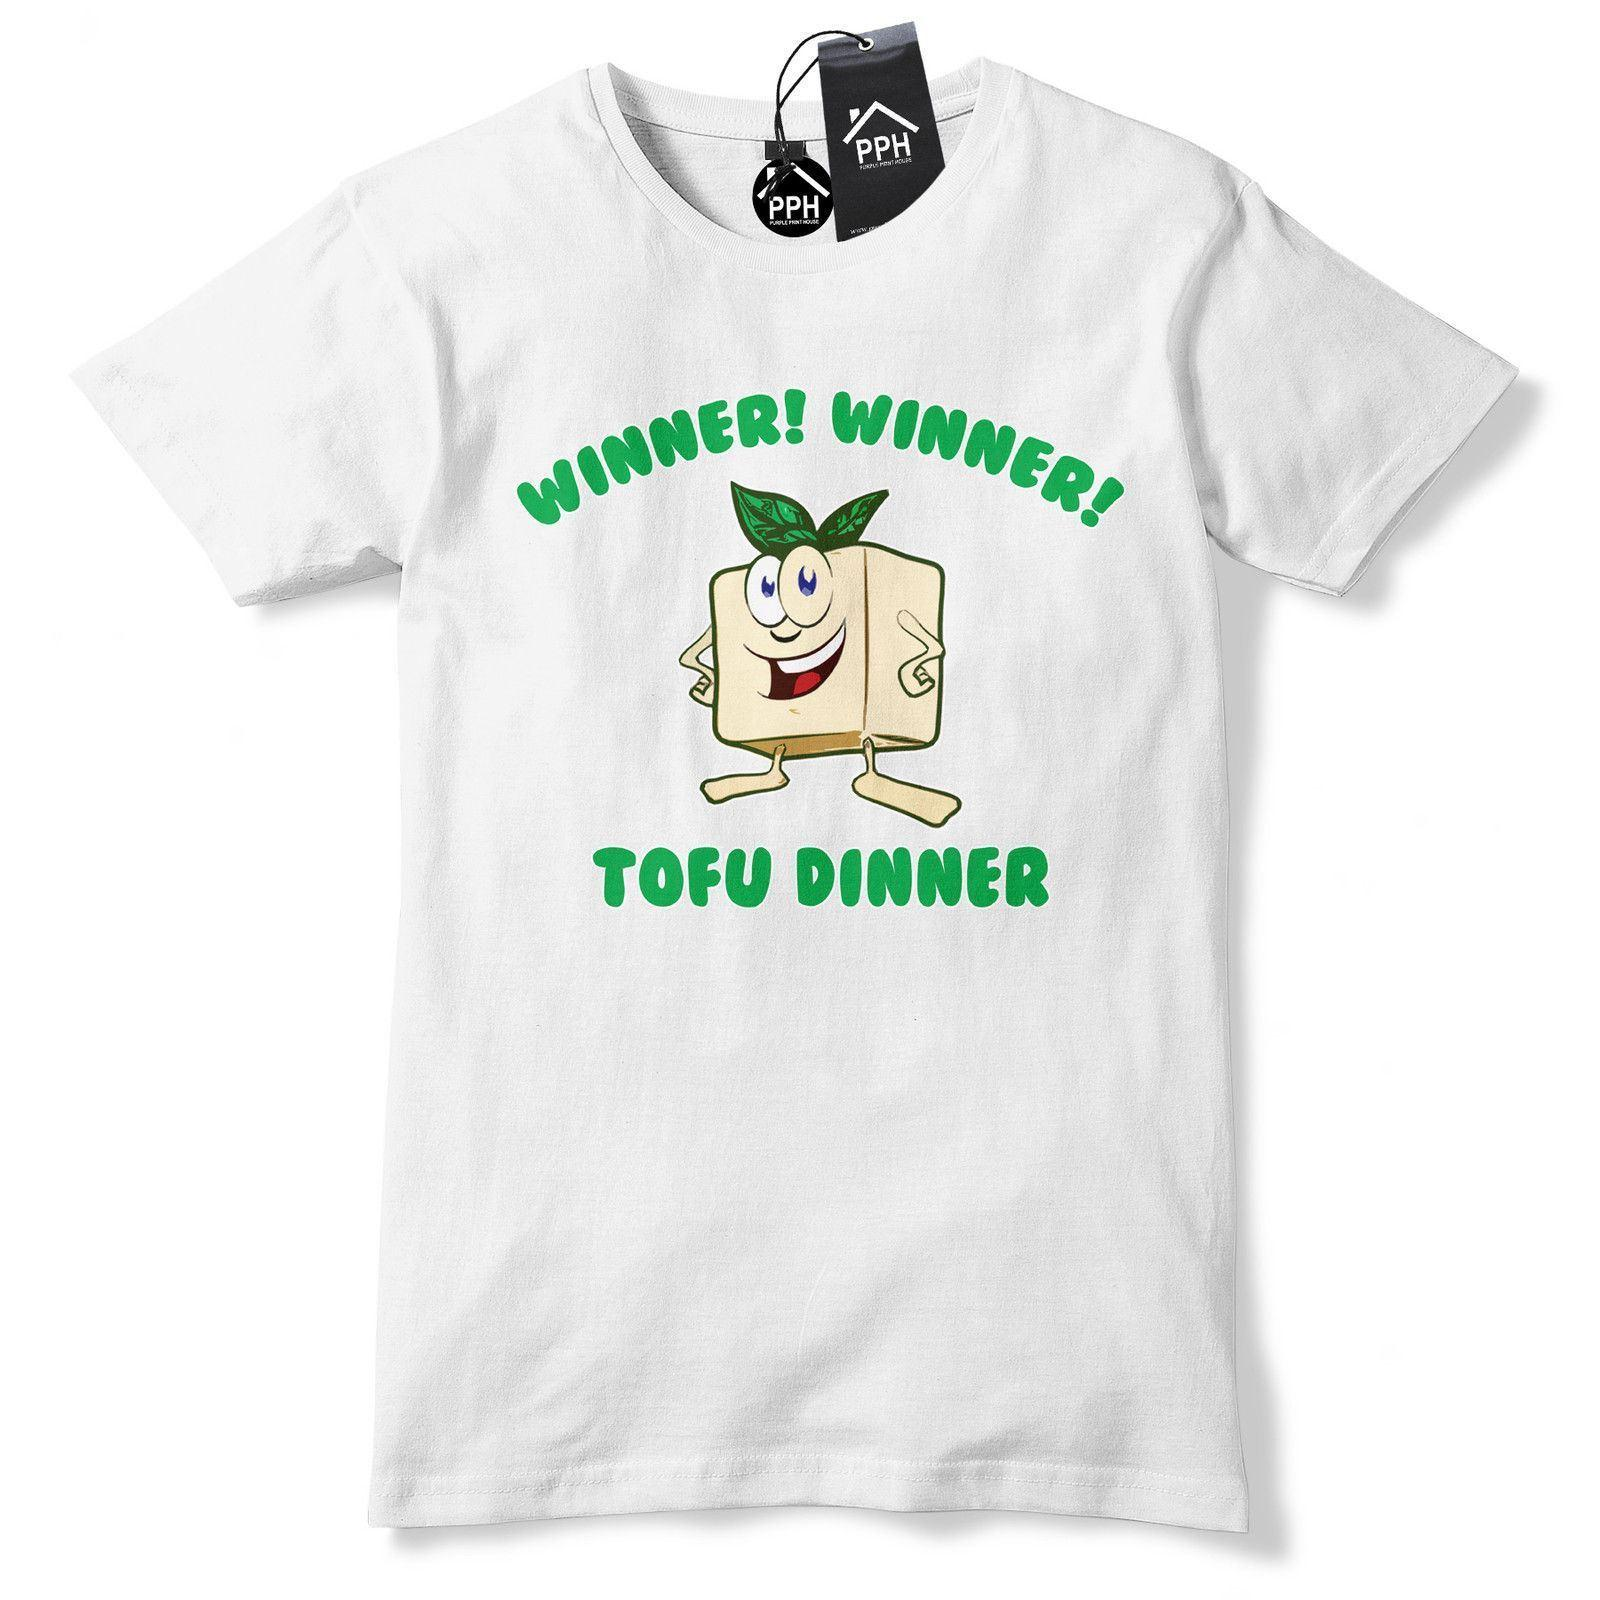 e28ebadf618 Winner Winner Tofu Dinner T Shirt Vegan Food Veg Vegetarian Meat Tee Top  631 Fashion Style Men Tee 2019 fashion t shirt